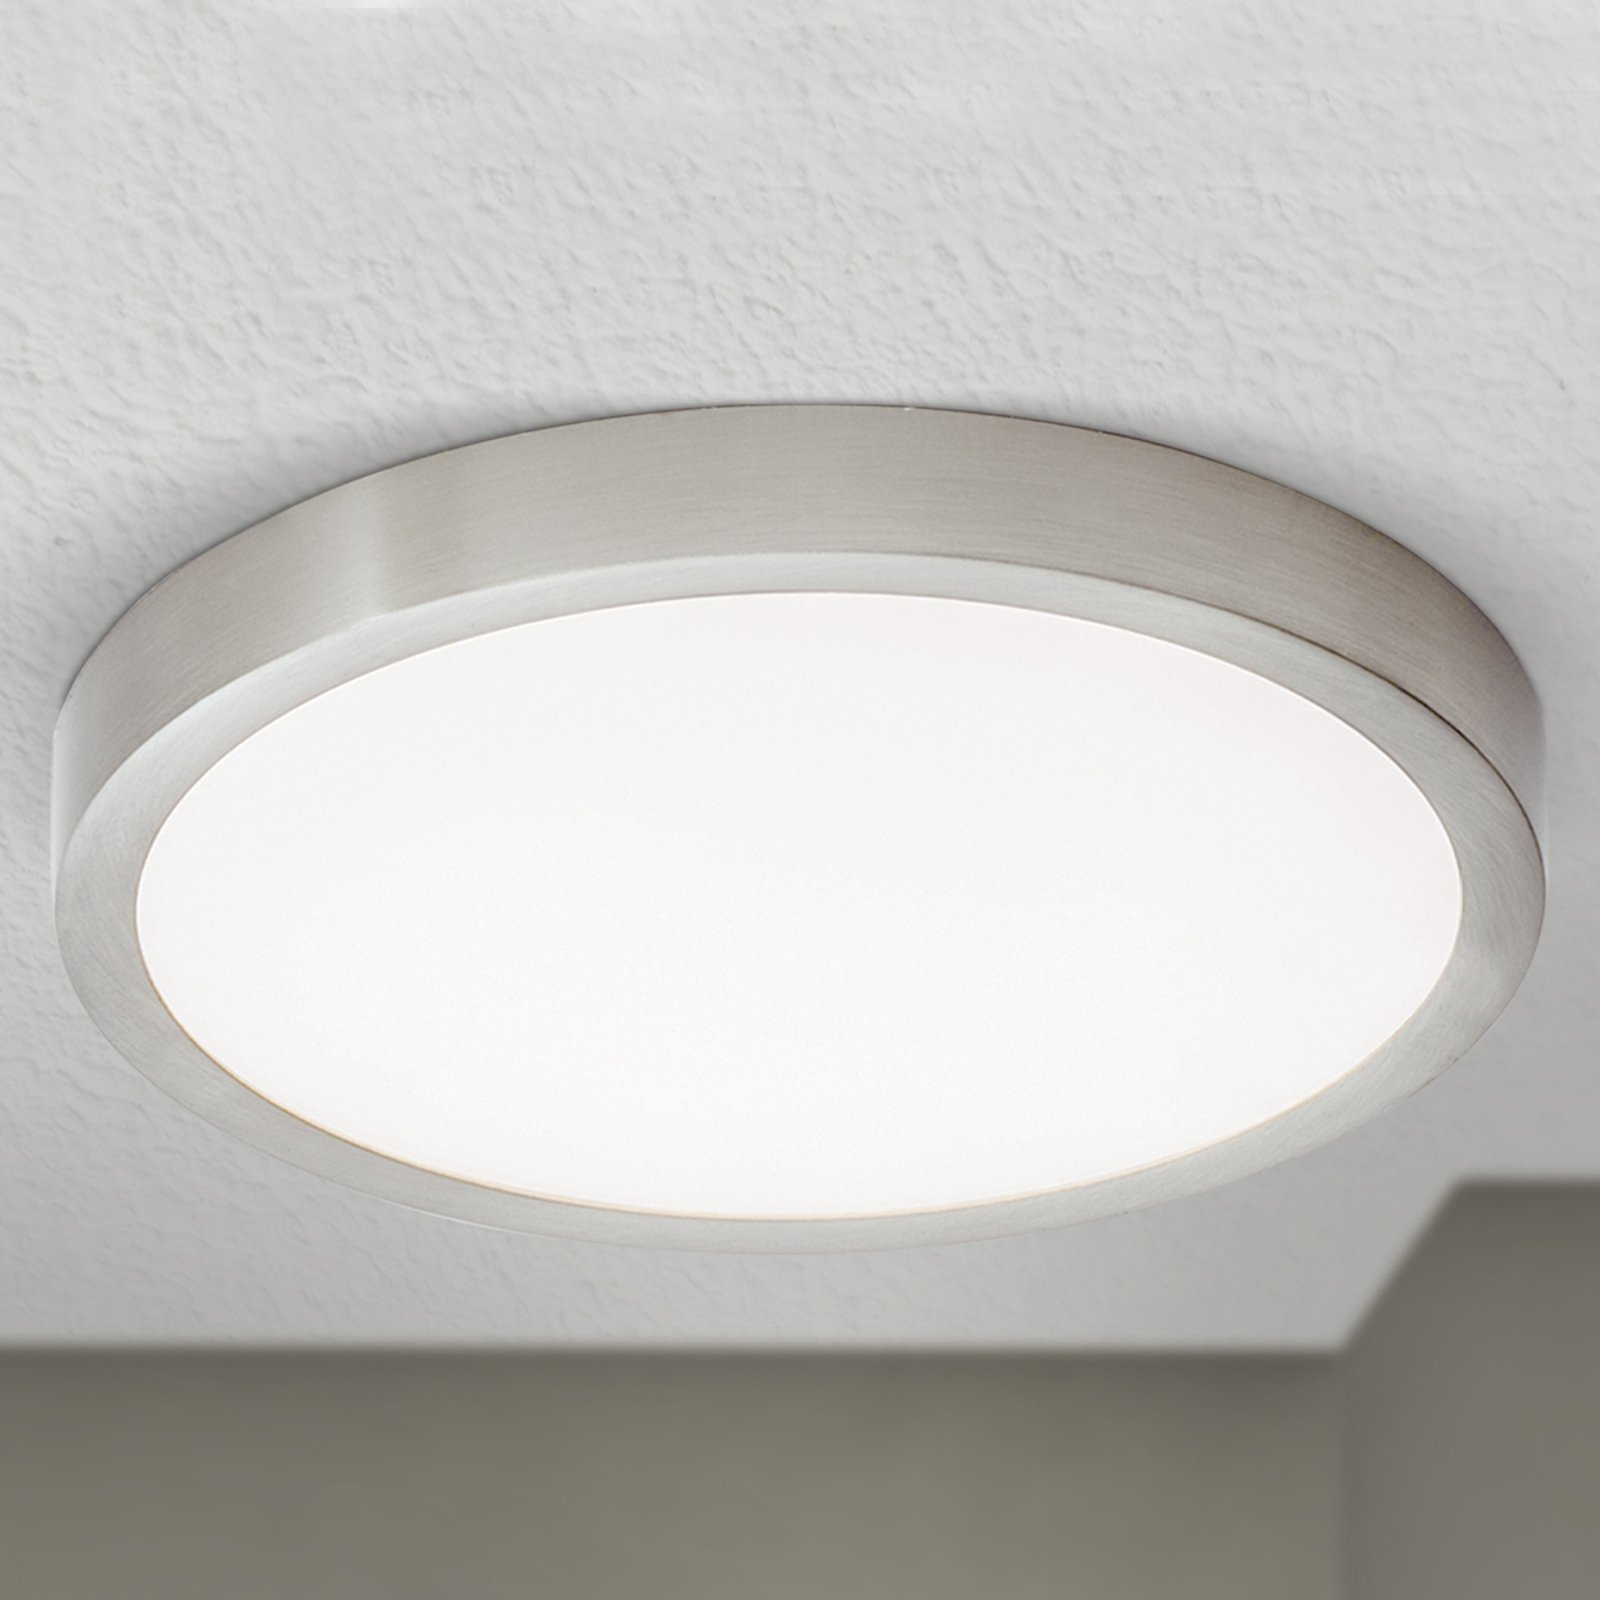 LED-taklampe Vika, rund, titan matt, Ø 23cm